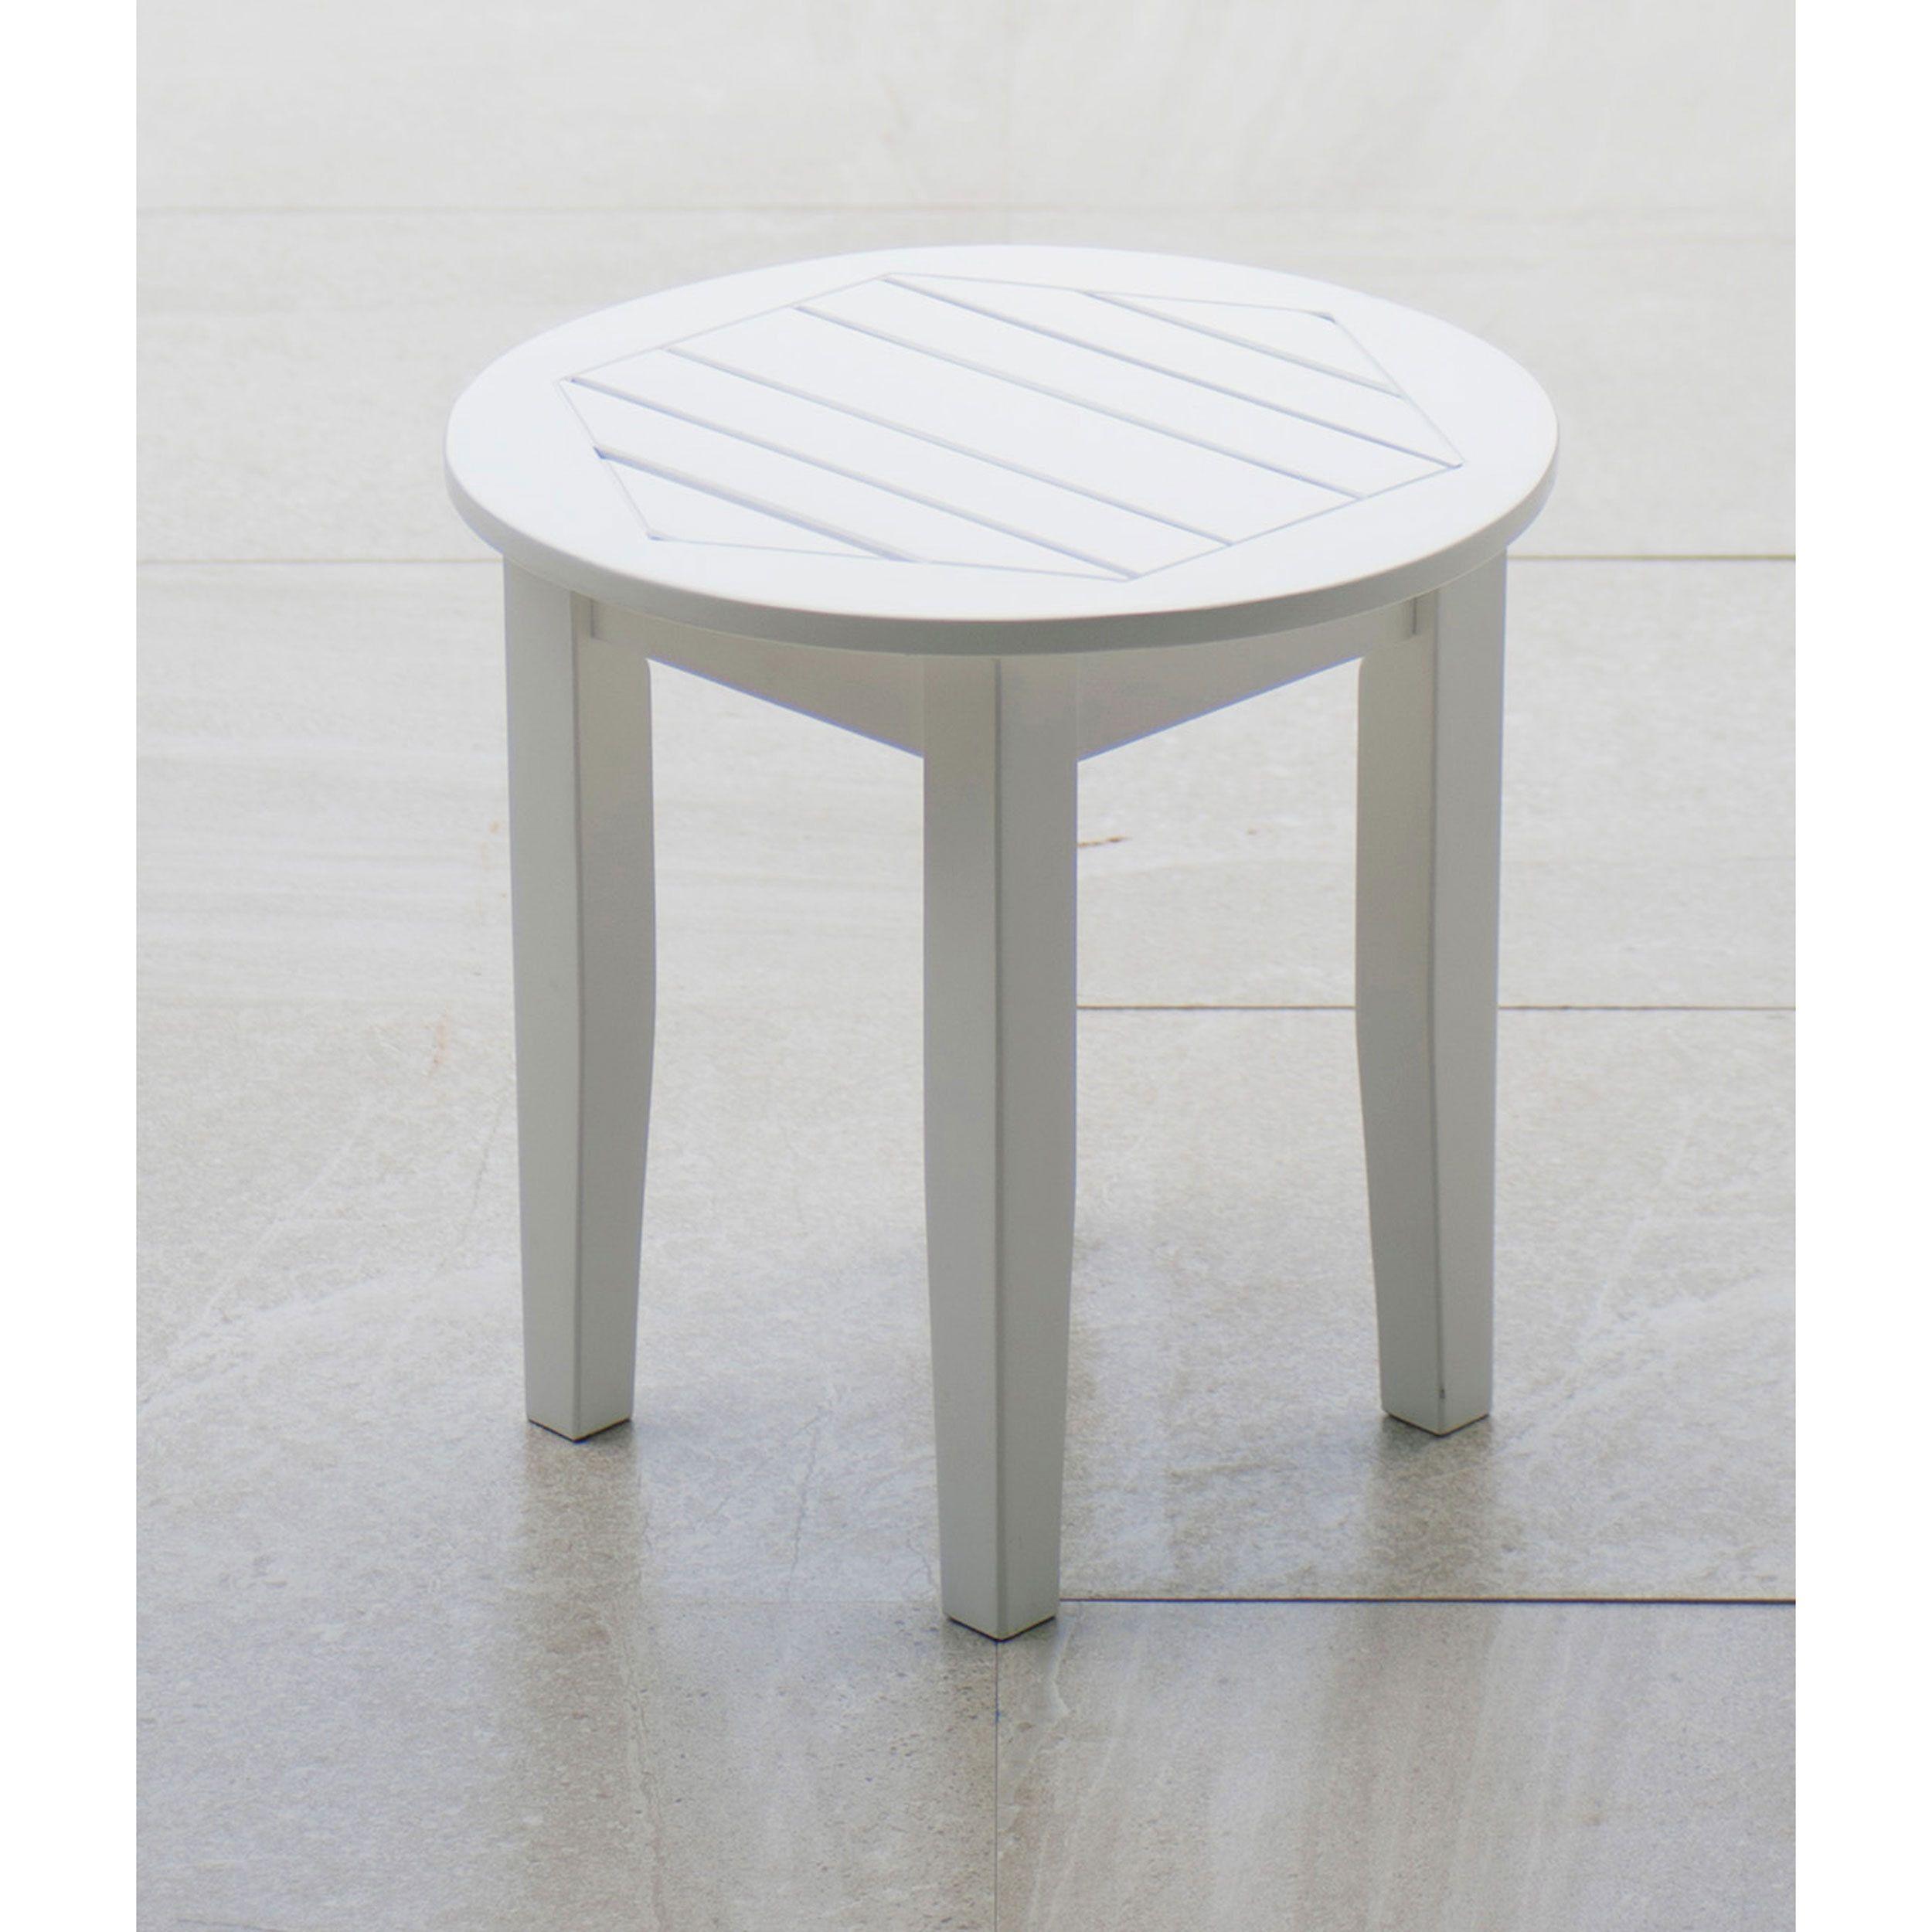 Cambridge Casual Alston White Side Table 18 in Lx 18 in W x 17